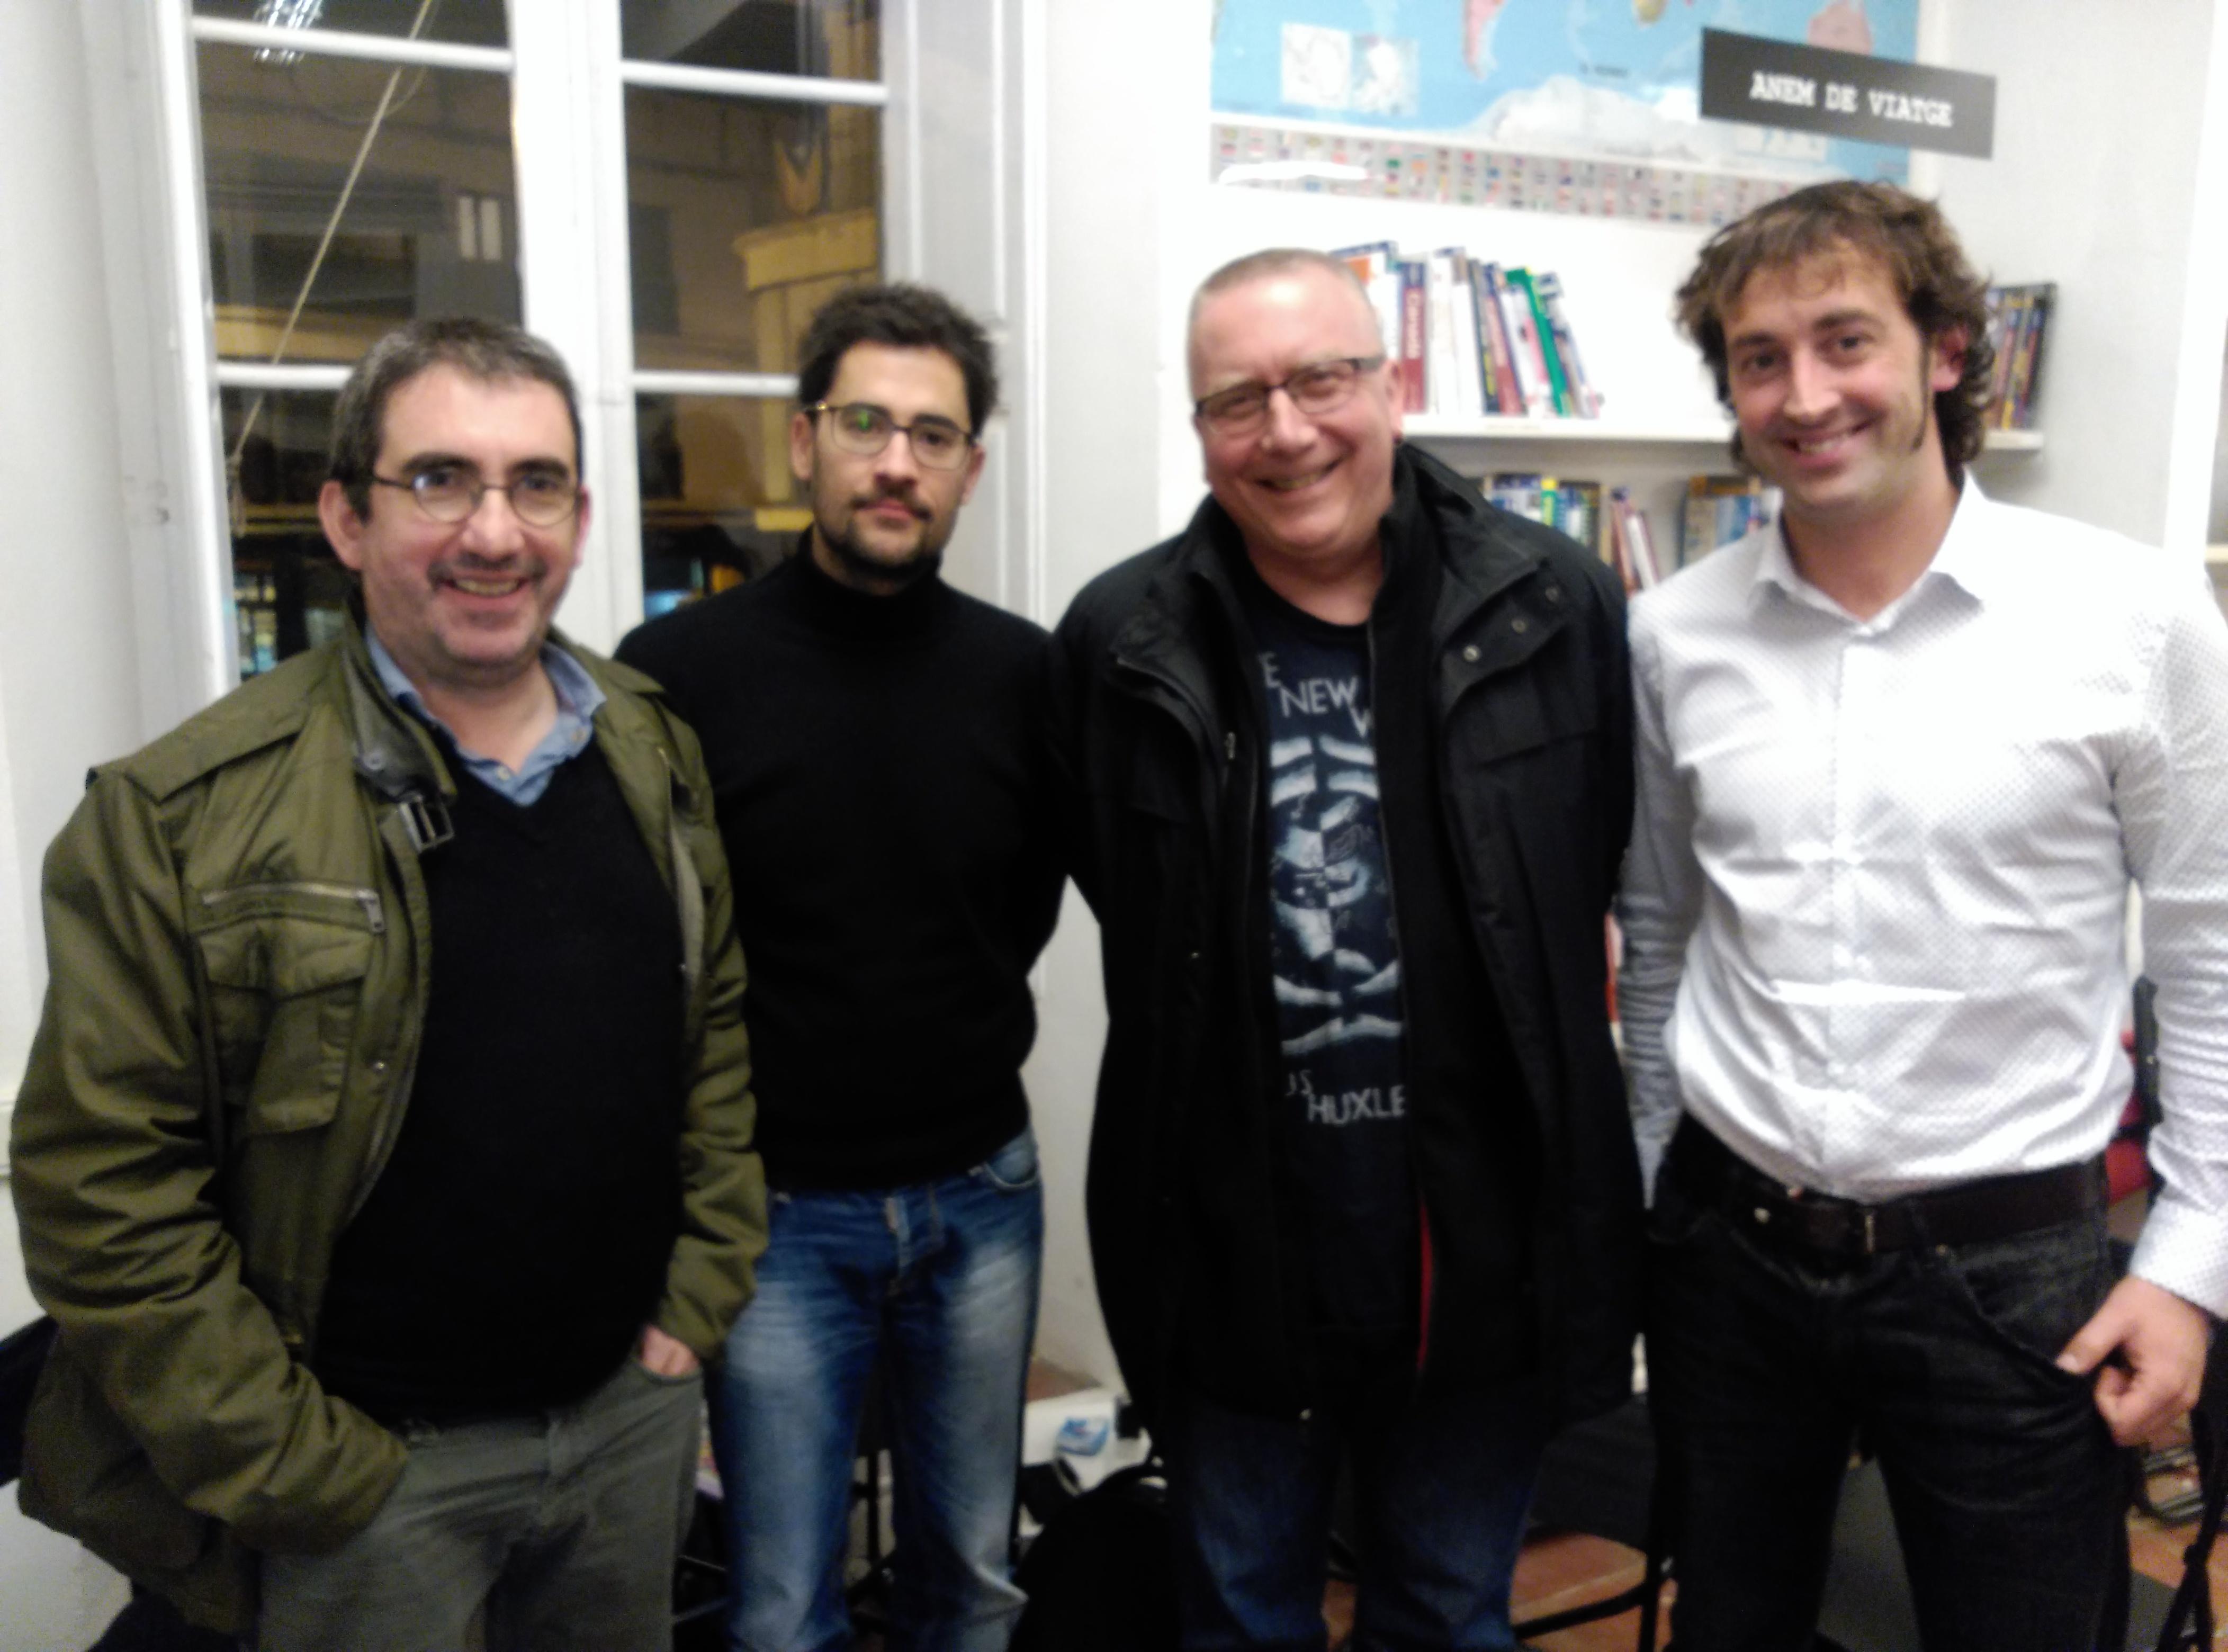 Miquel Aguirre, Damià Bardera, Matthew Tree i Jordi Dausà a la llibreria L'Altell.